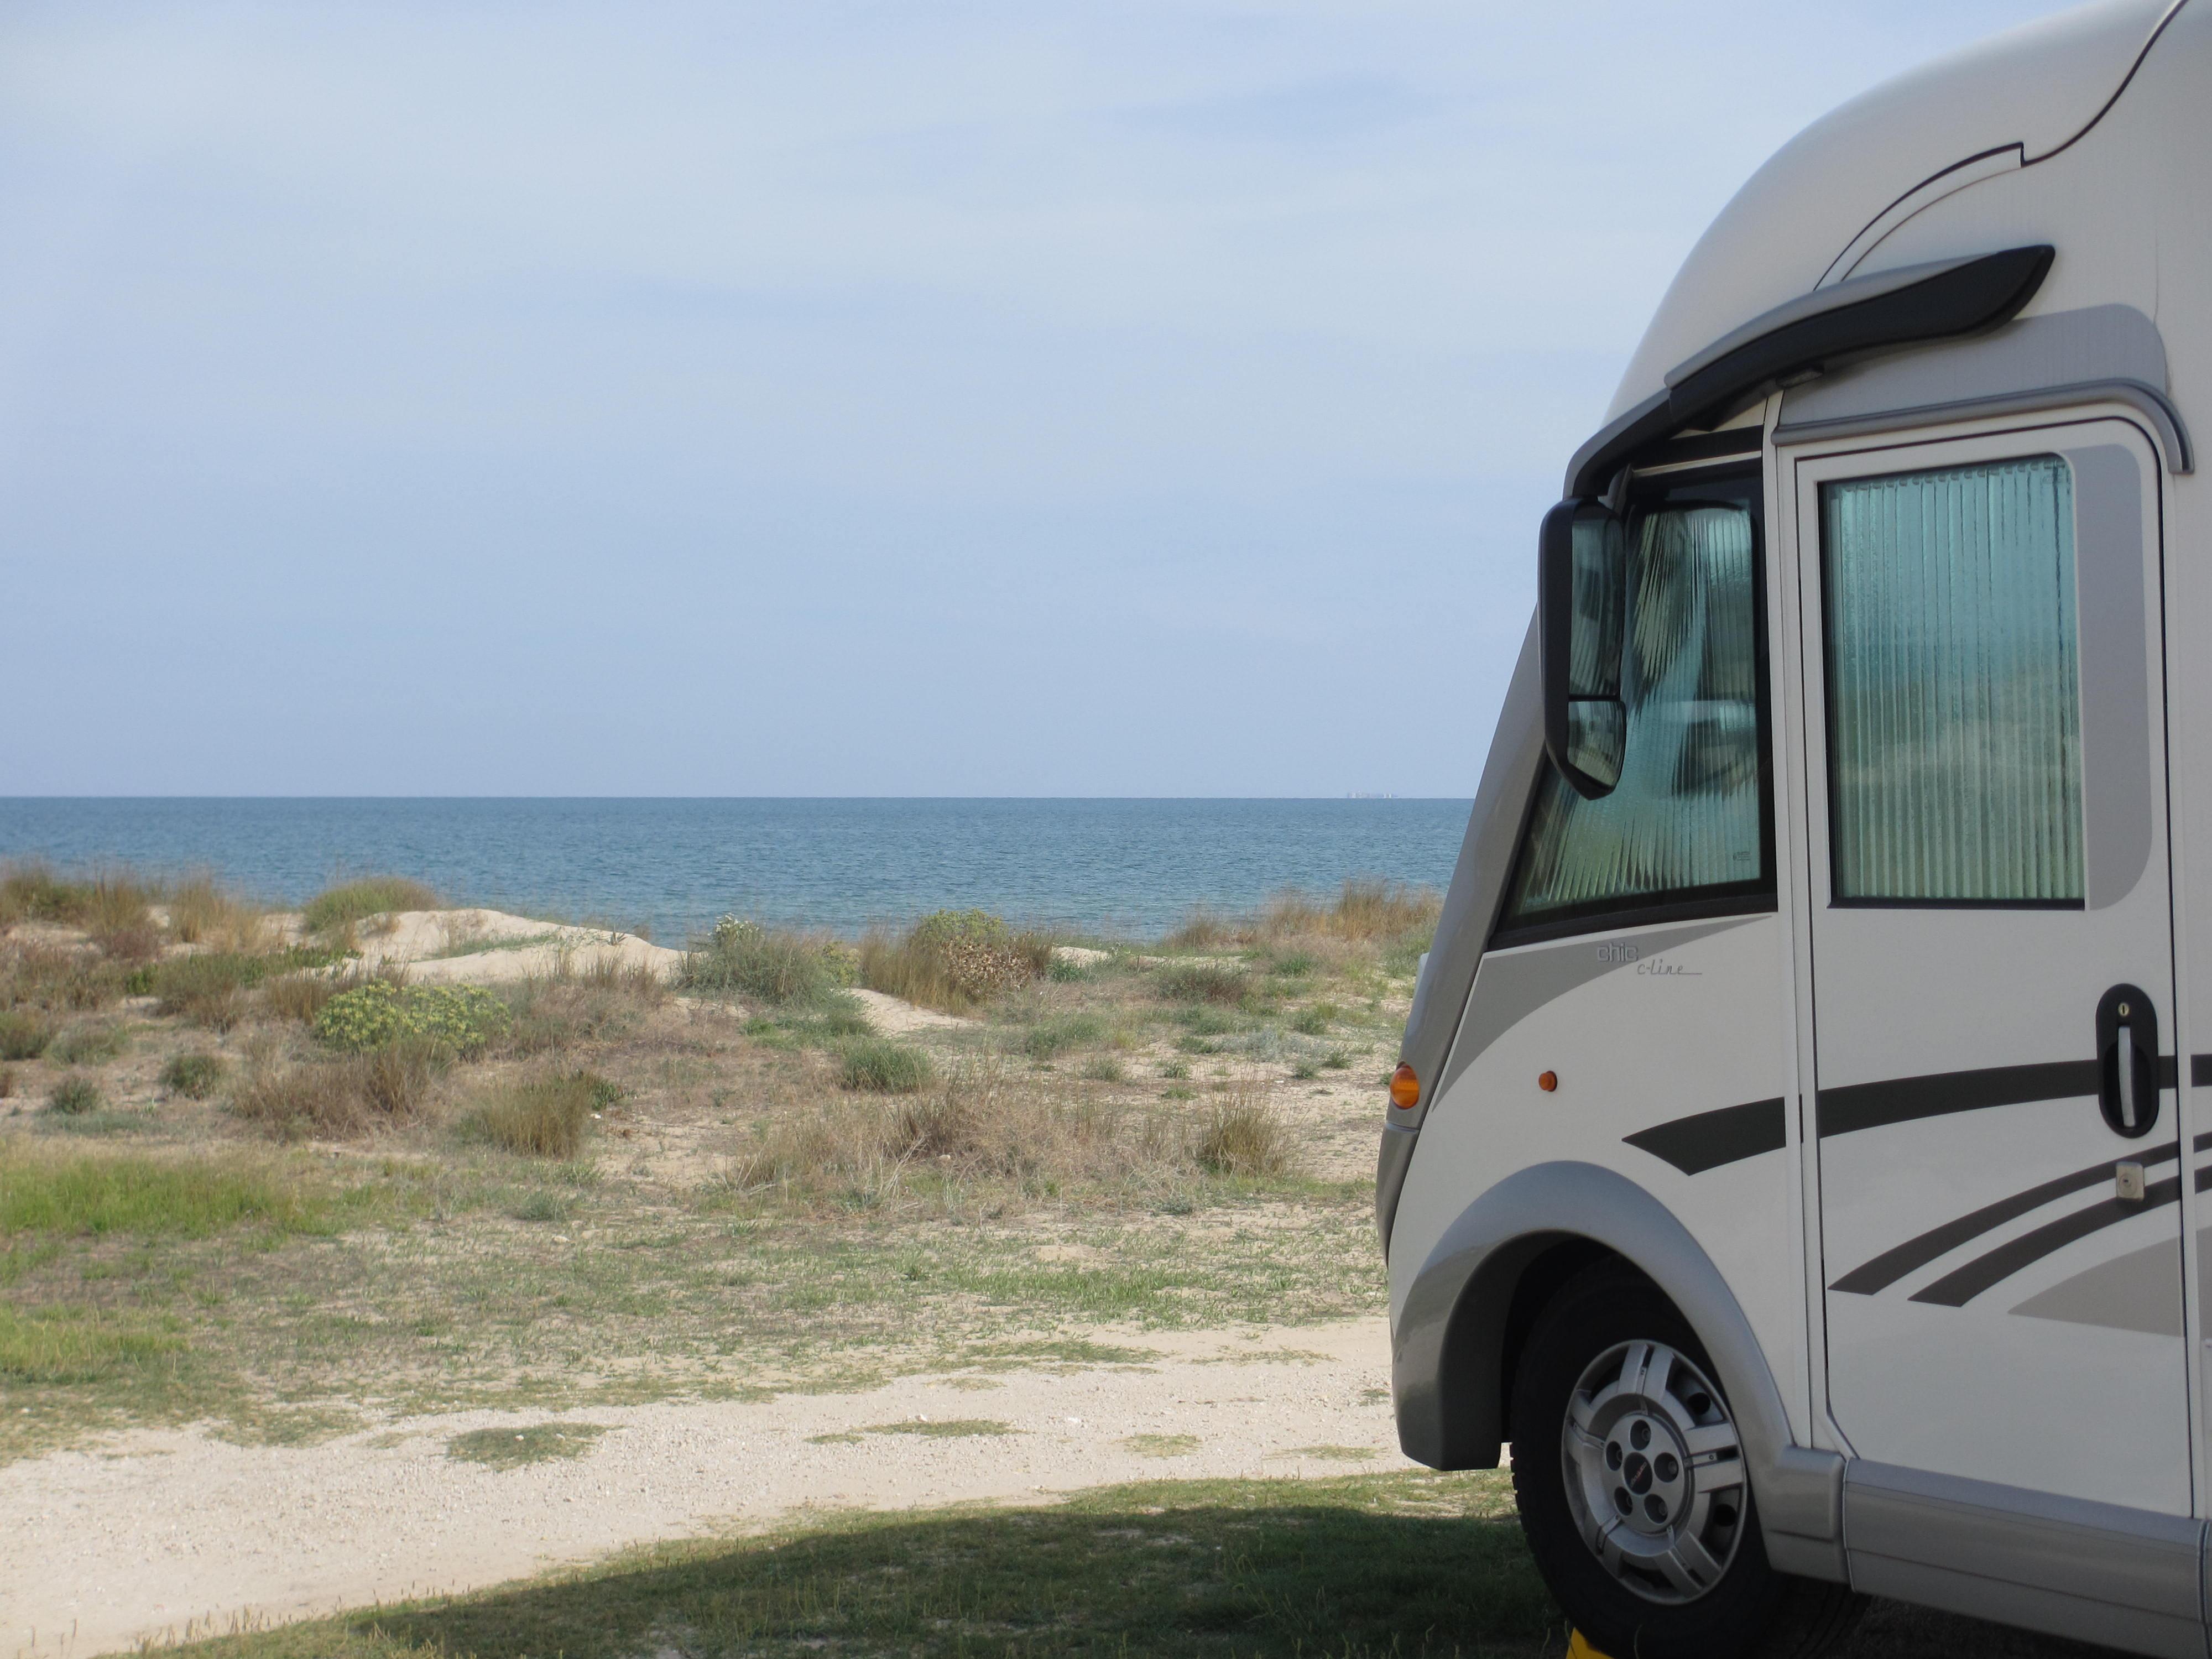 camping-image